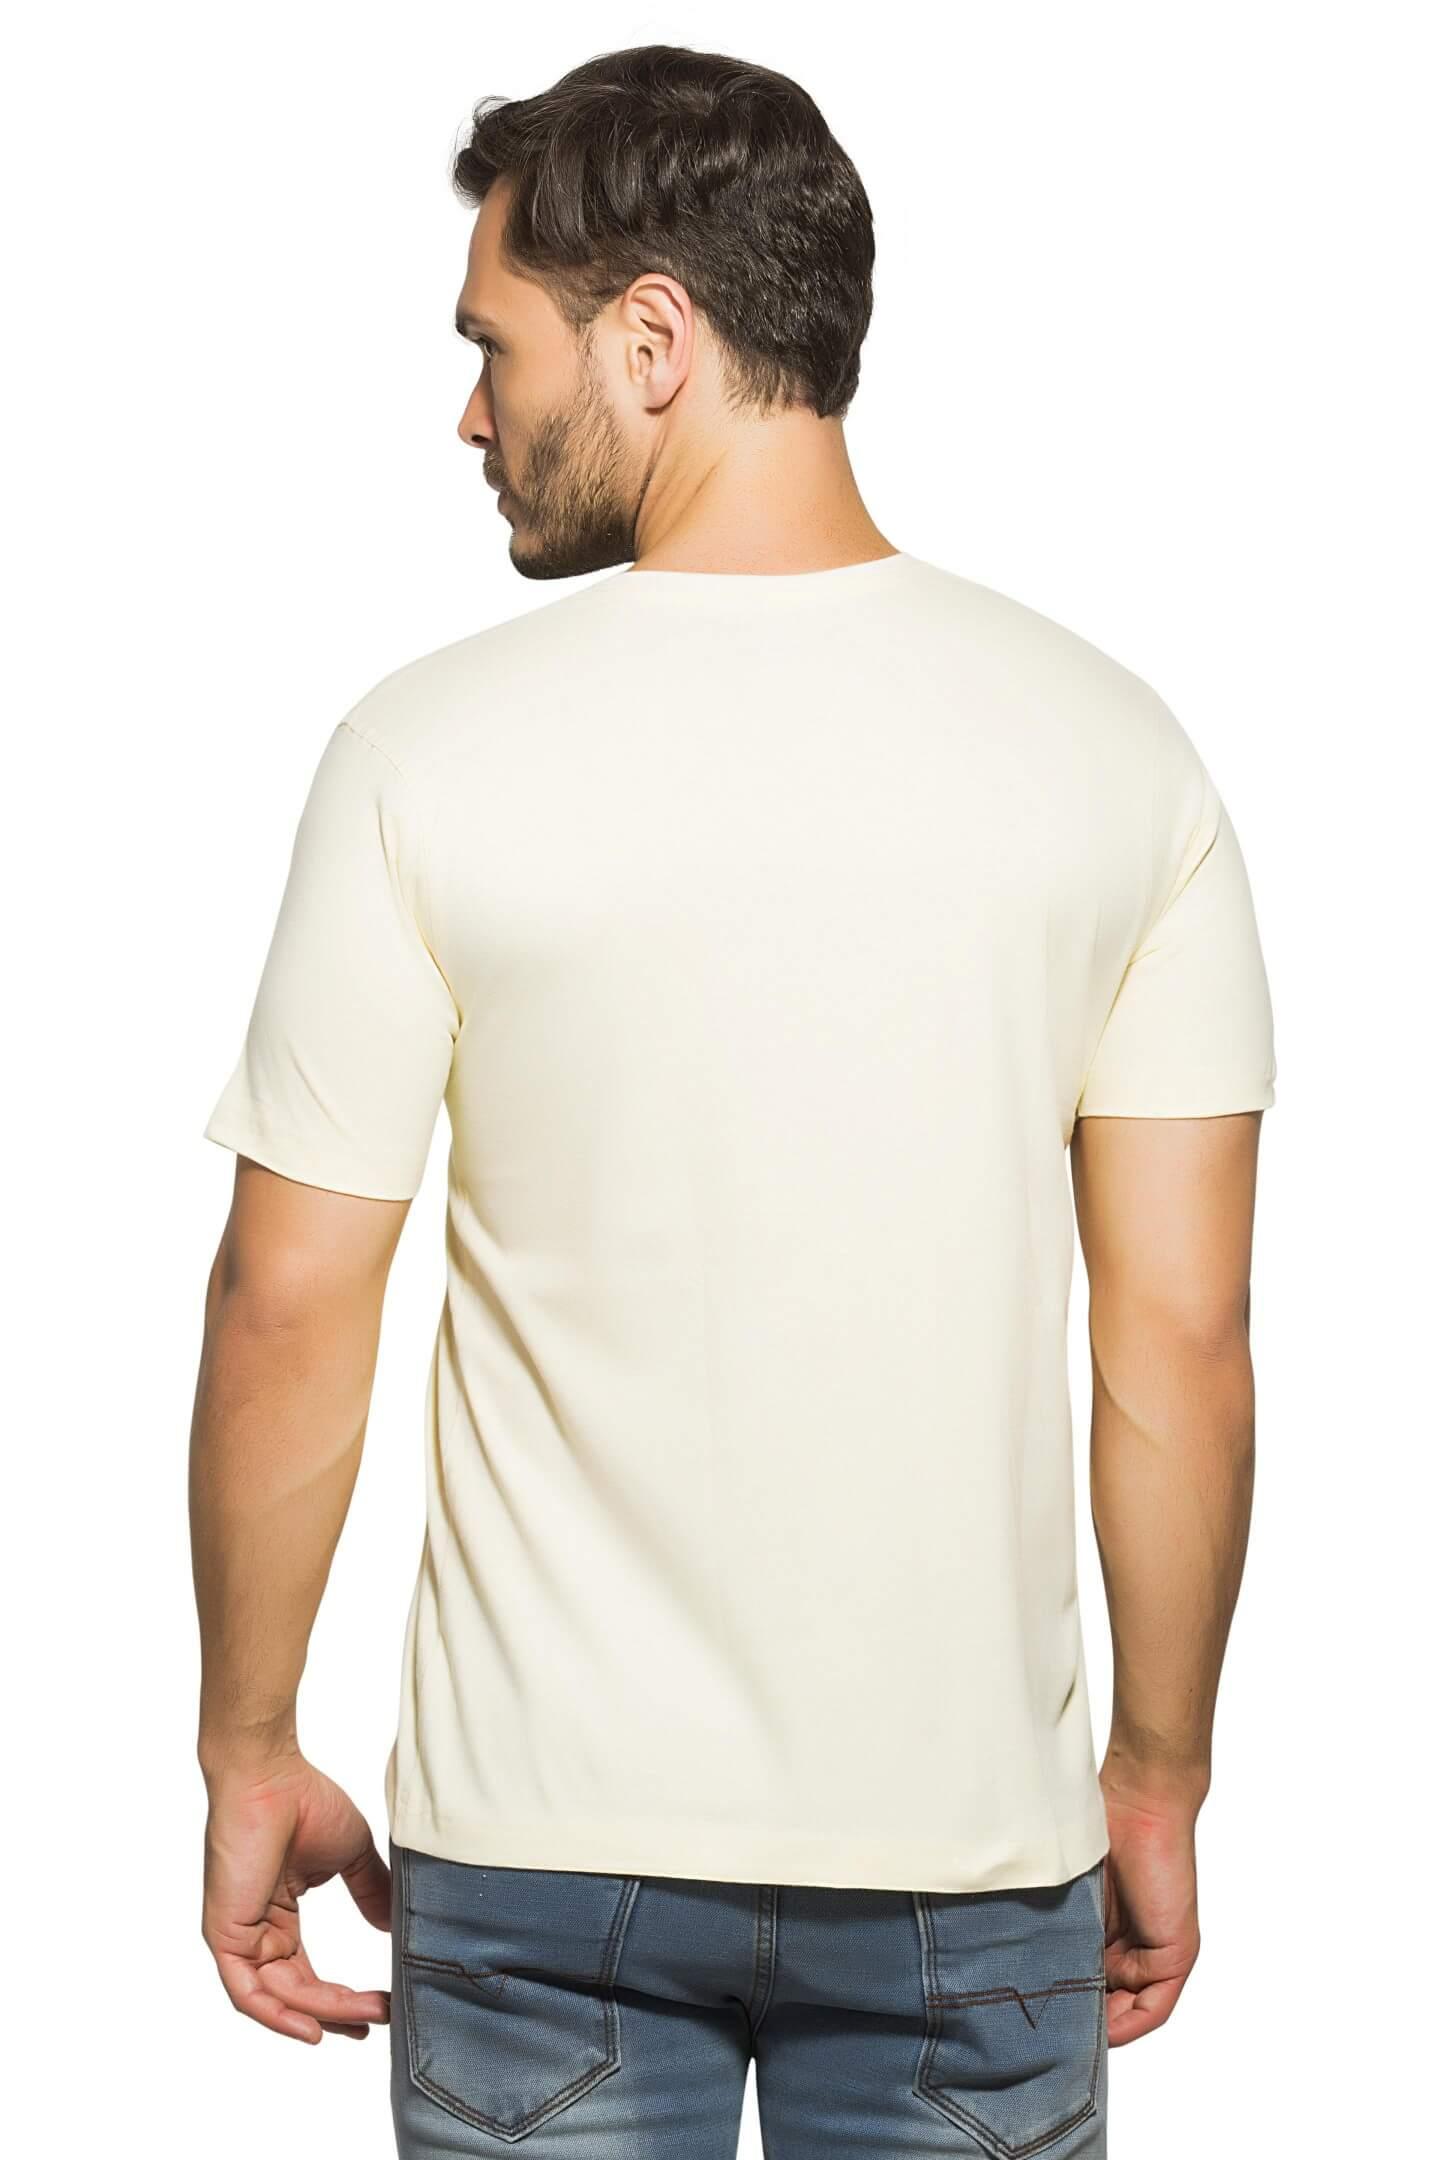 b417f23eaff Buy Off White Plain V Neck Half Sleeve T-Shirt products online